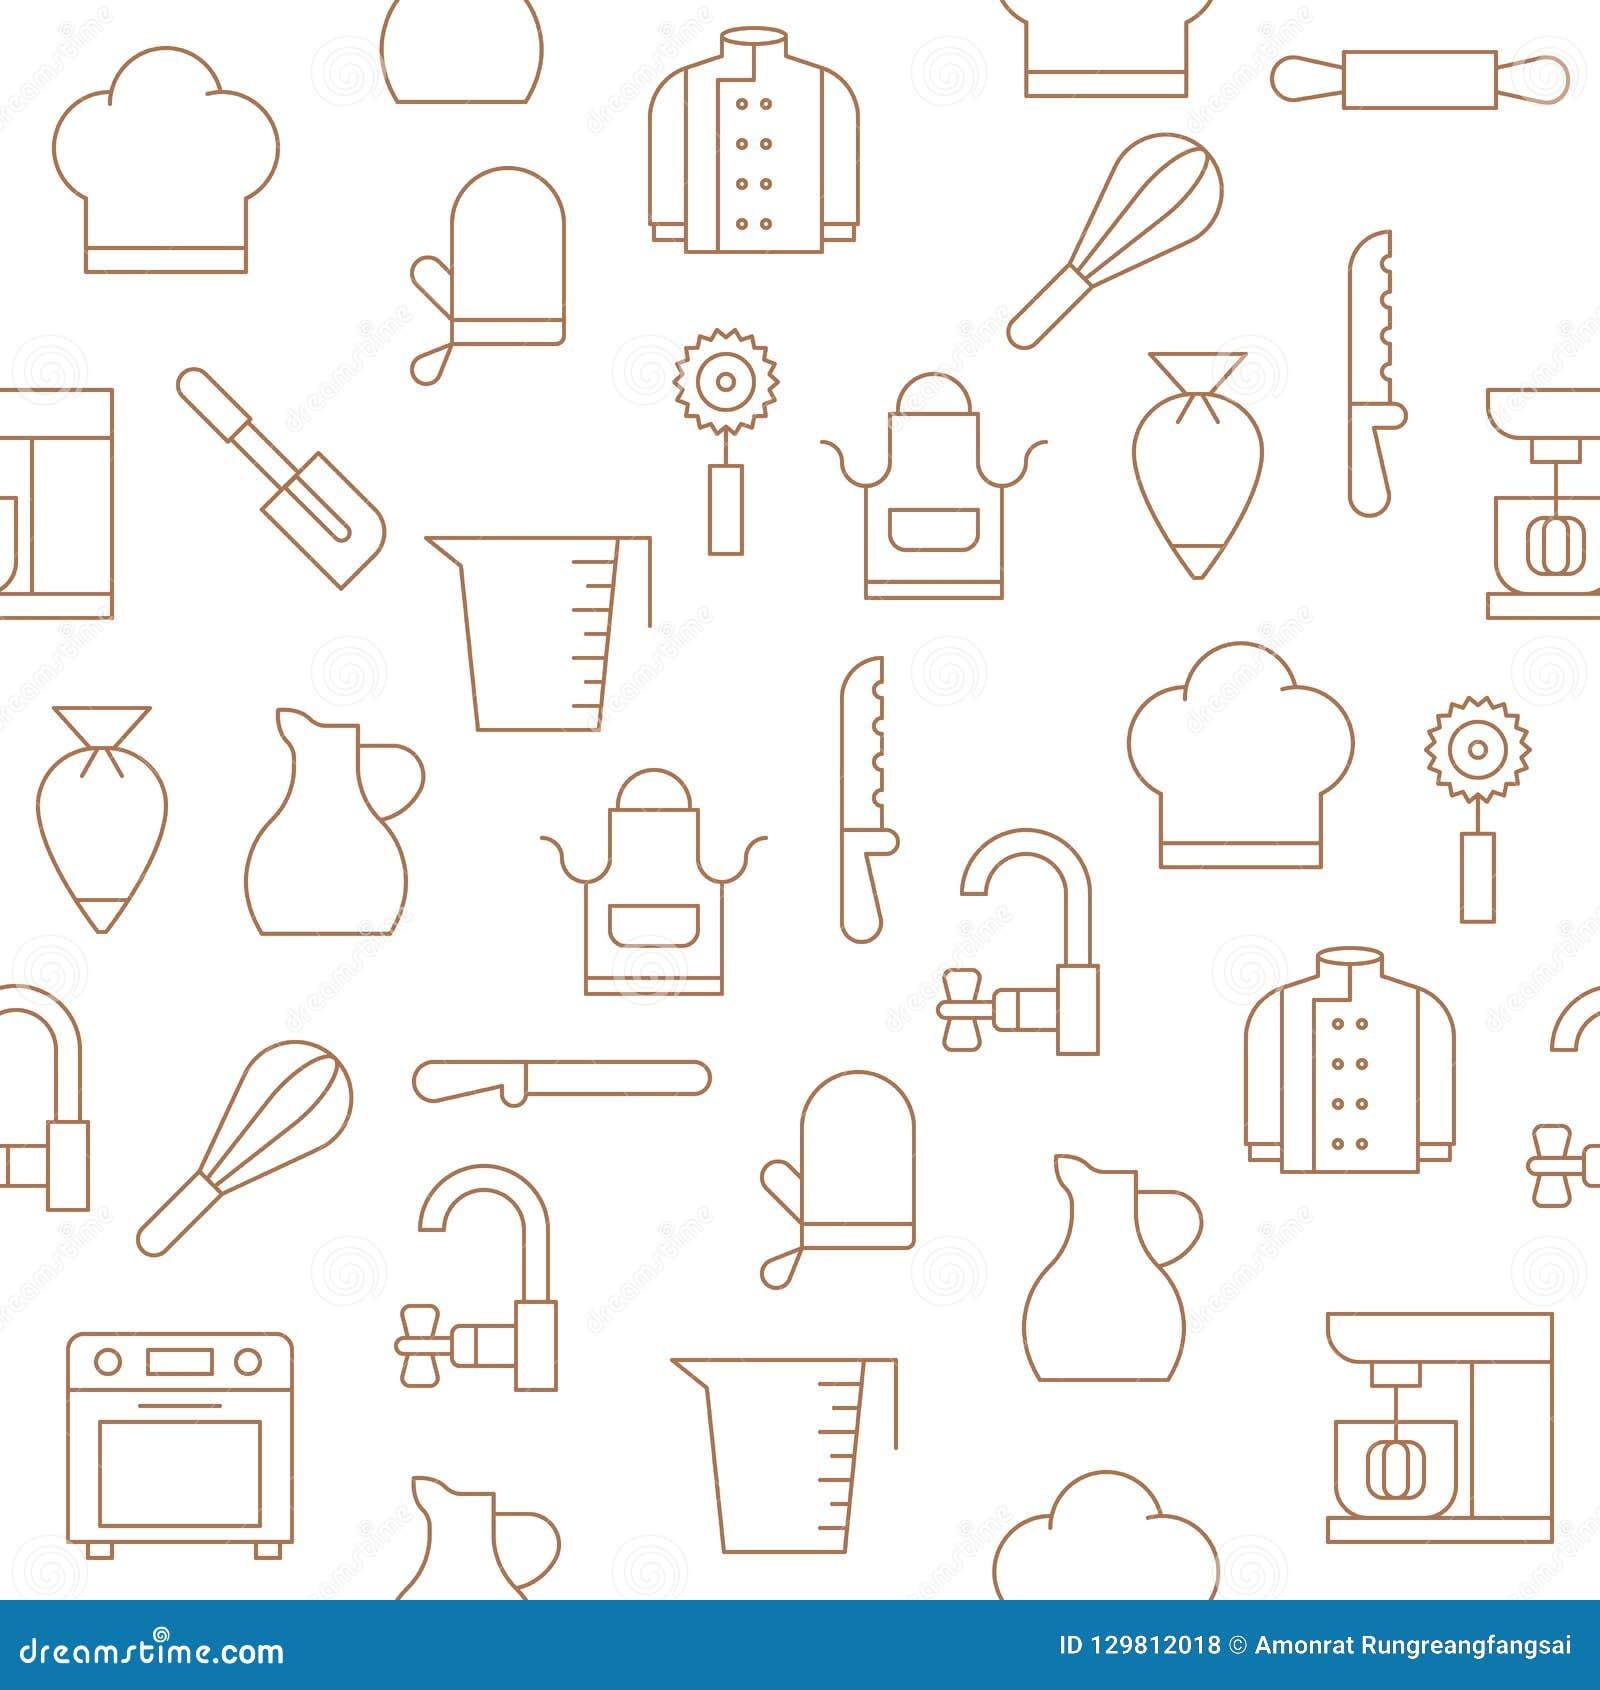 Bakery Equipment And Kitchen Utensils Seamless Pattern For Wallpaper